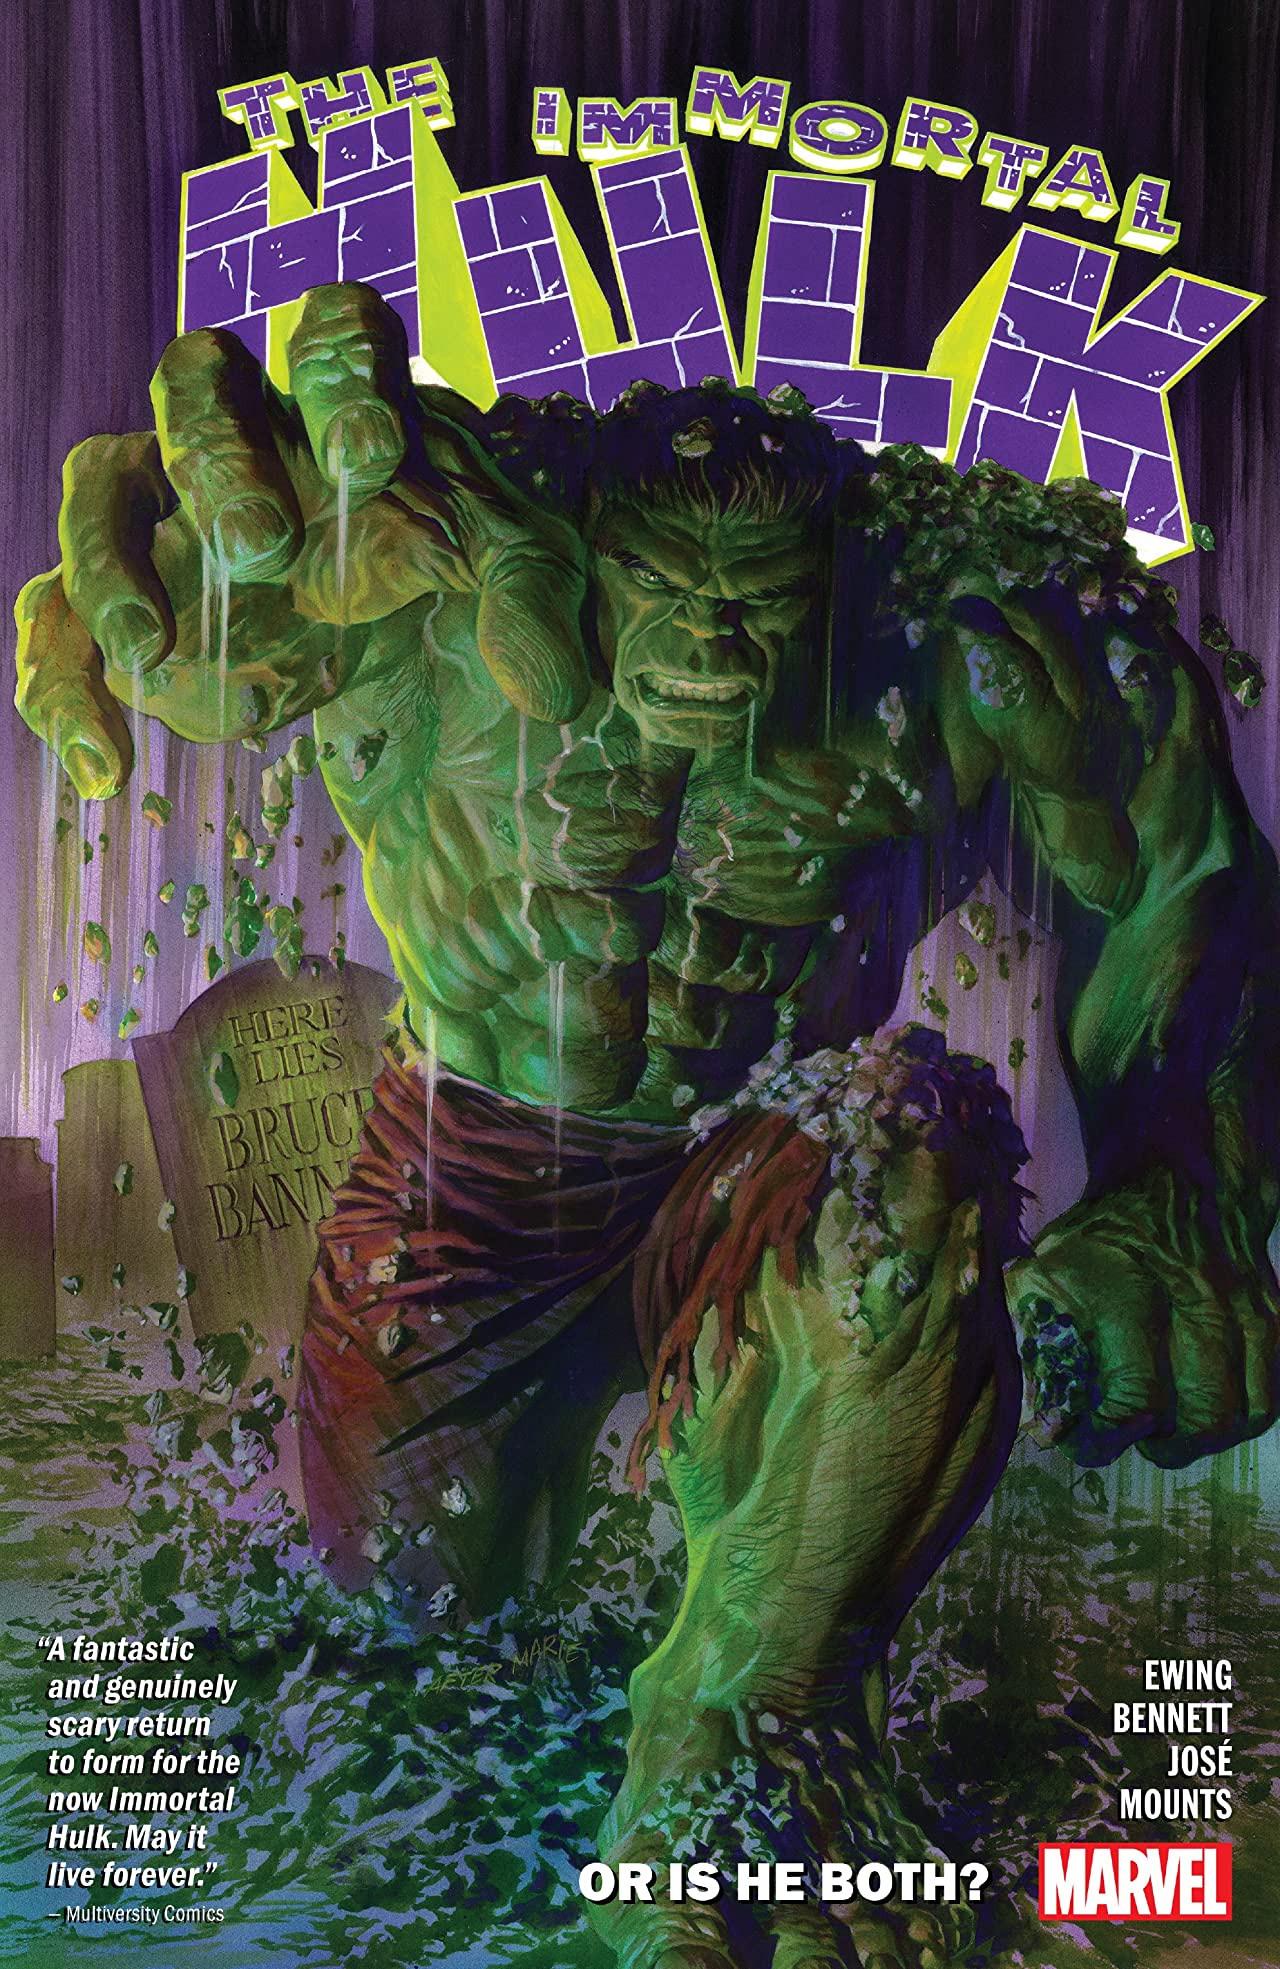 Immortal Hulk TPB Vol 1 1: Or Is He Both?